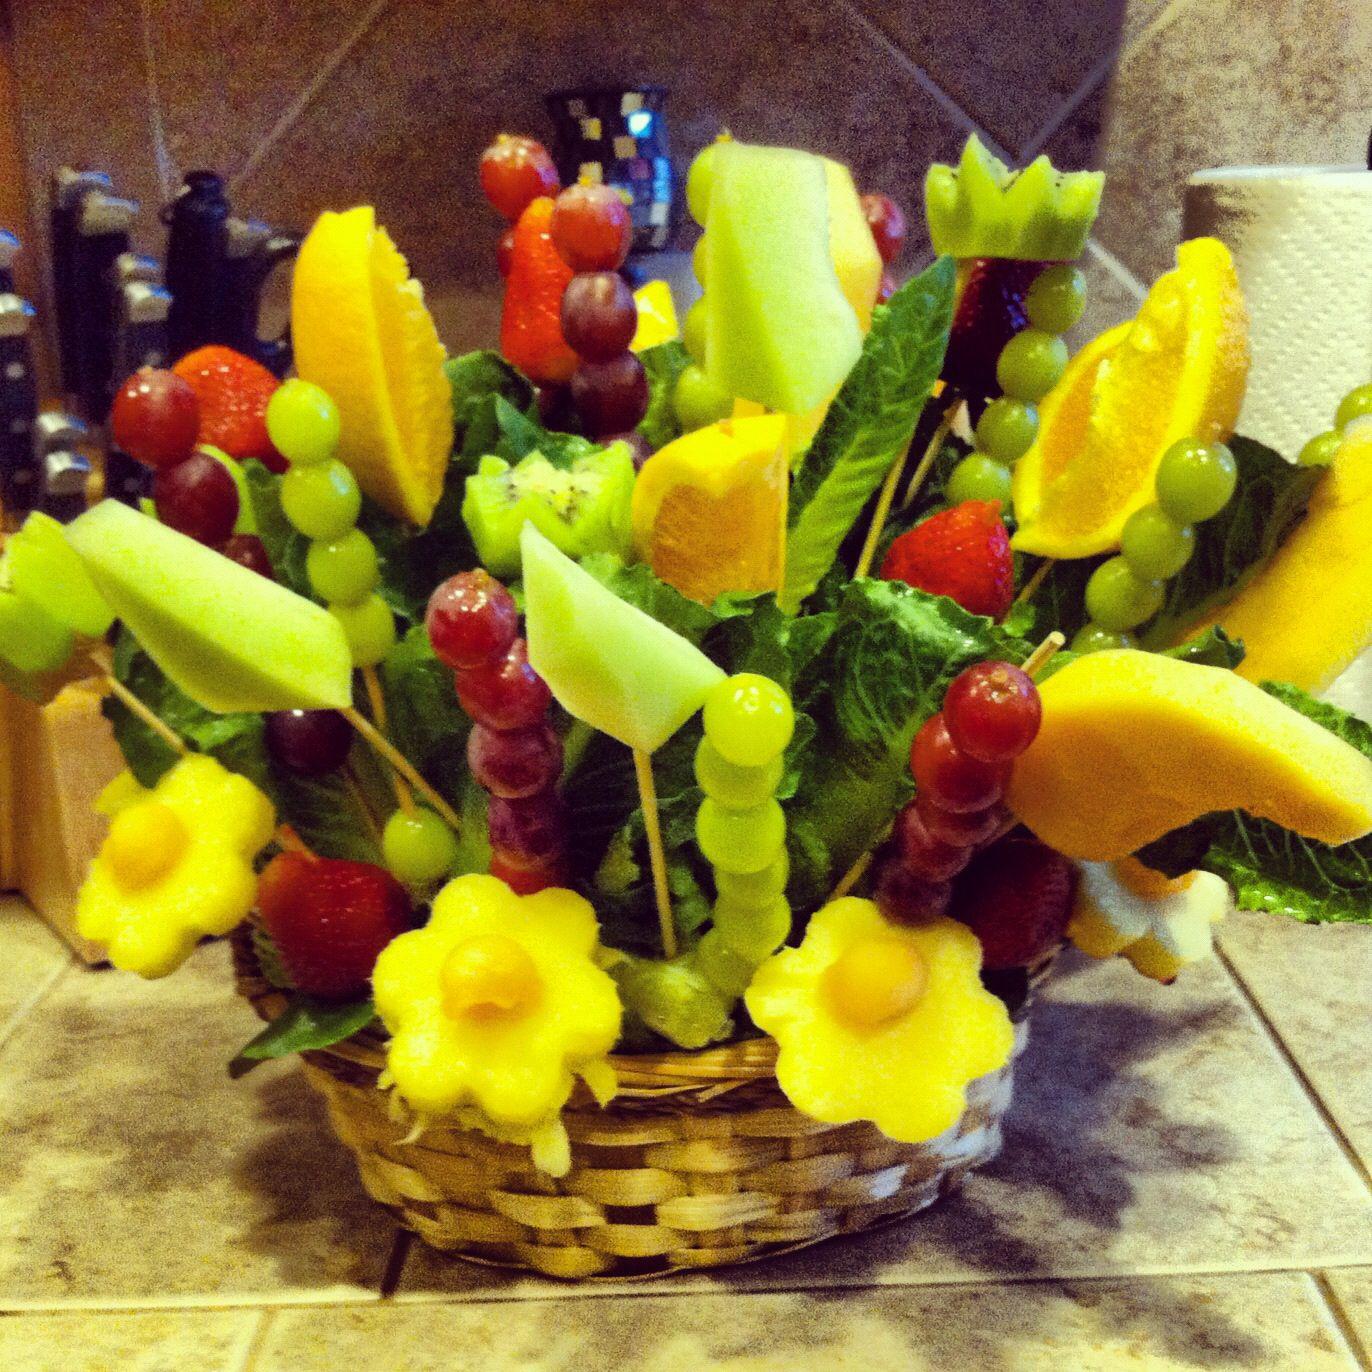 DIY Fruit basket | Fruity Ideas! | Pinterest | Fresh fruit ...